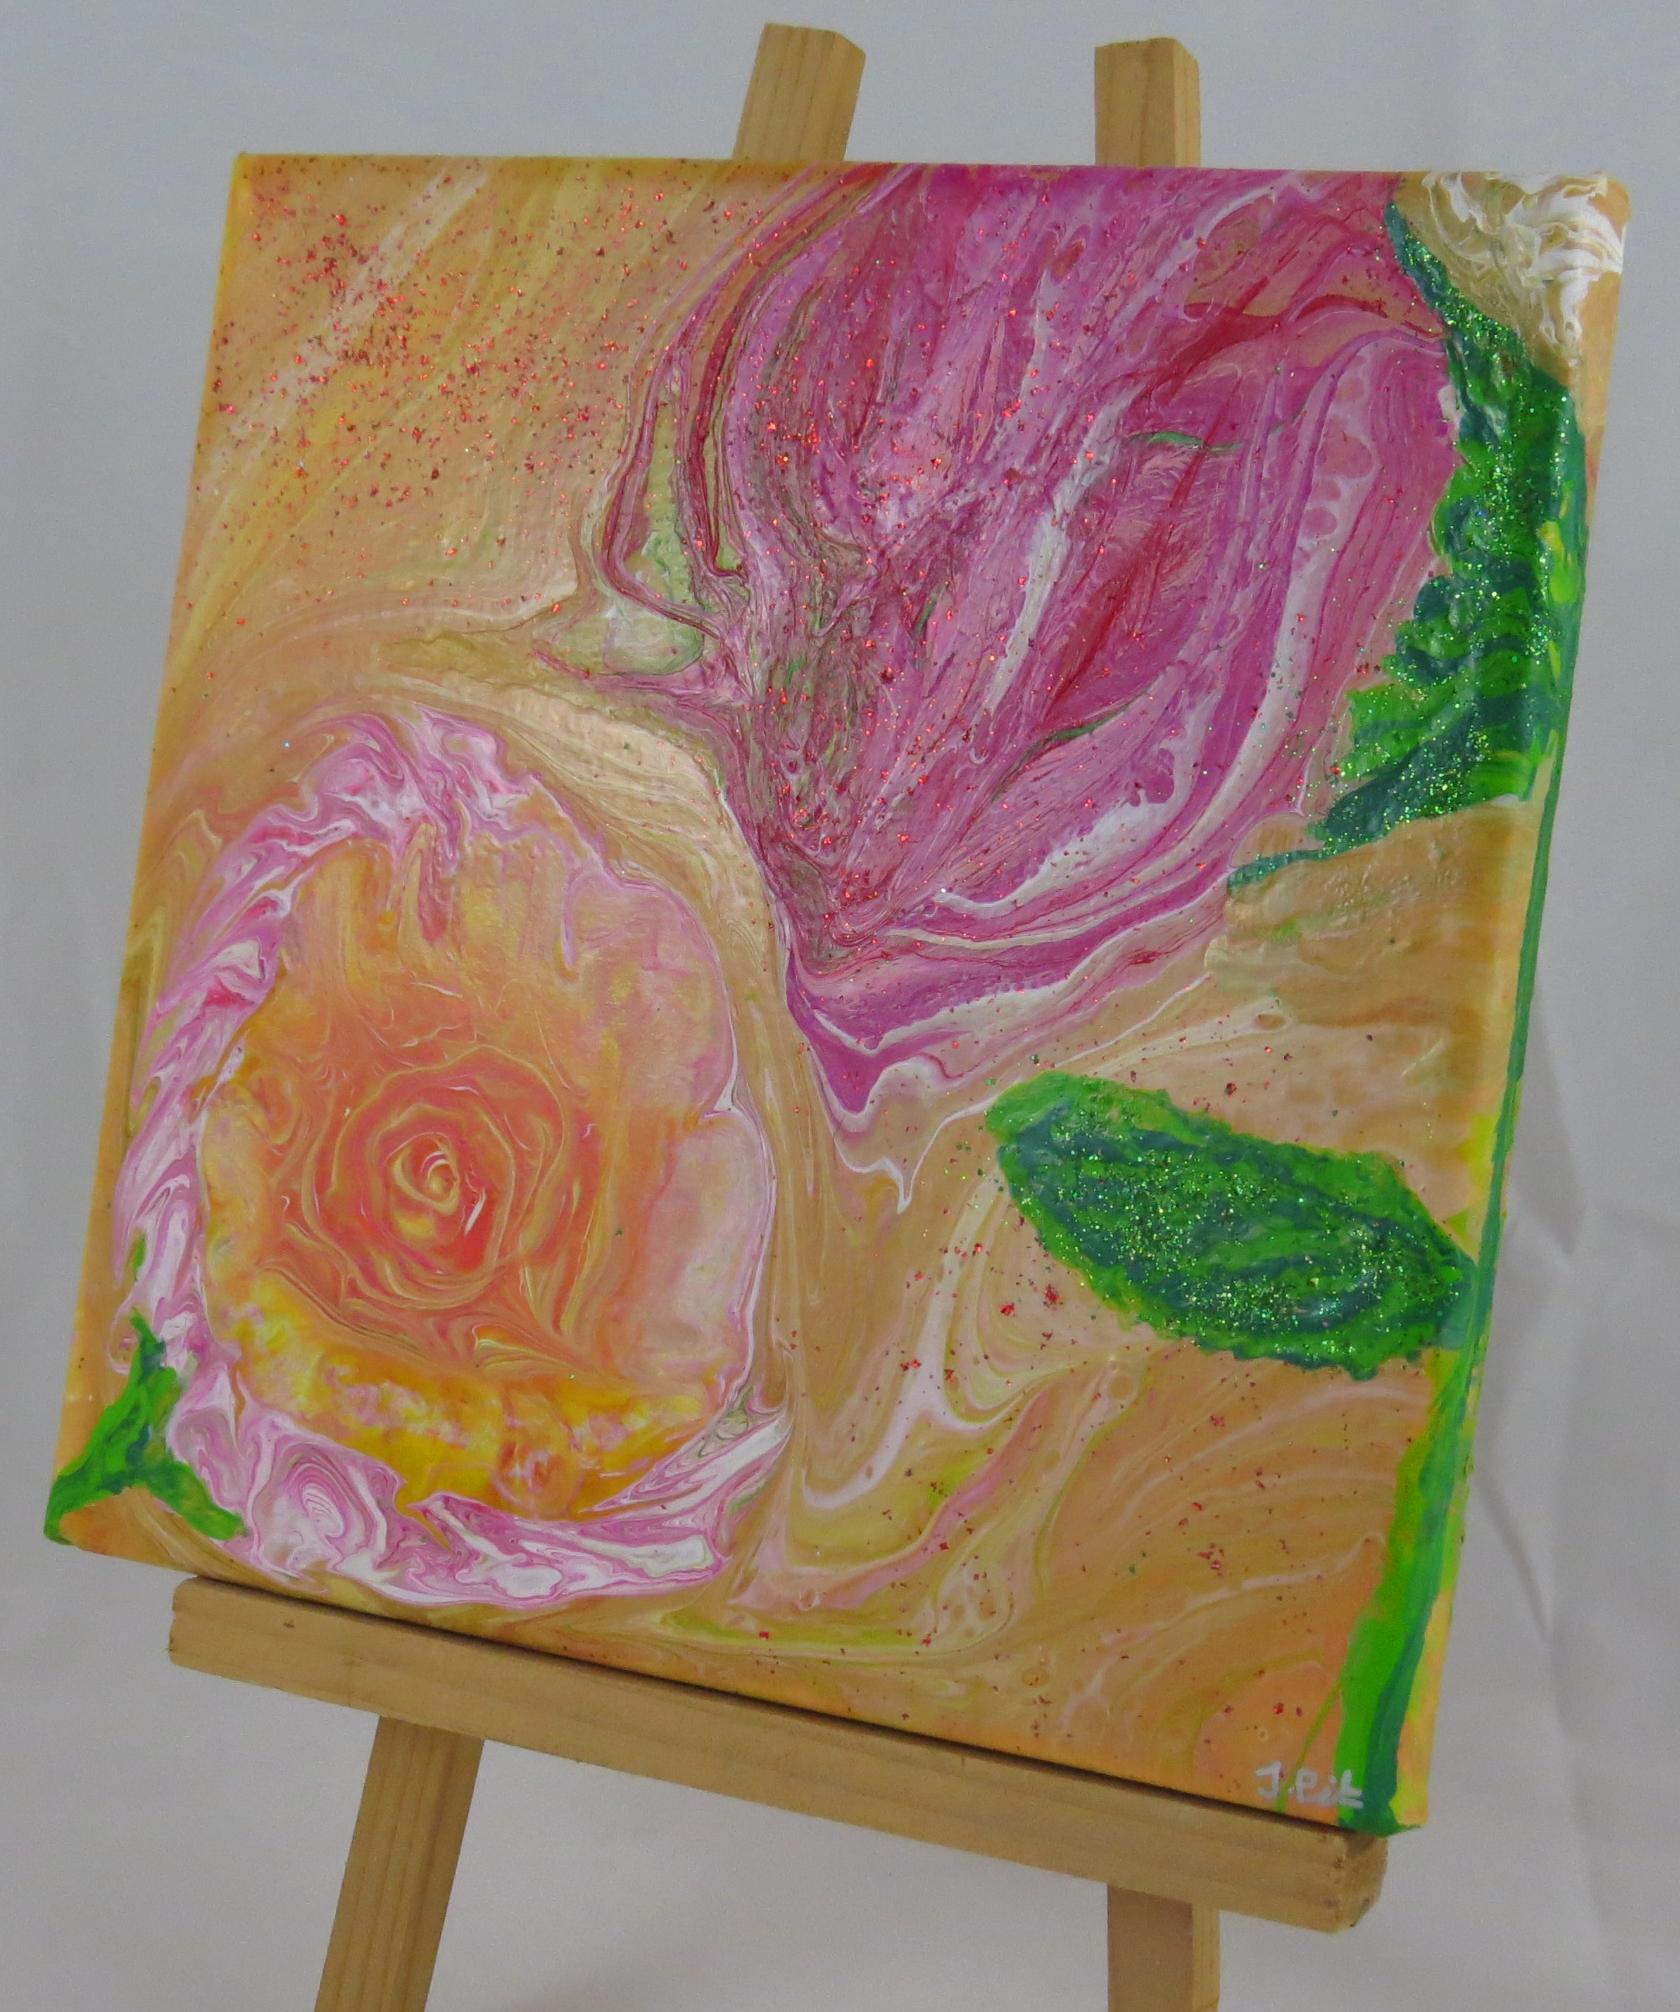 HI Art Medium - Flowers